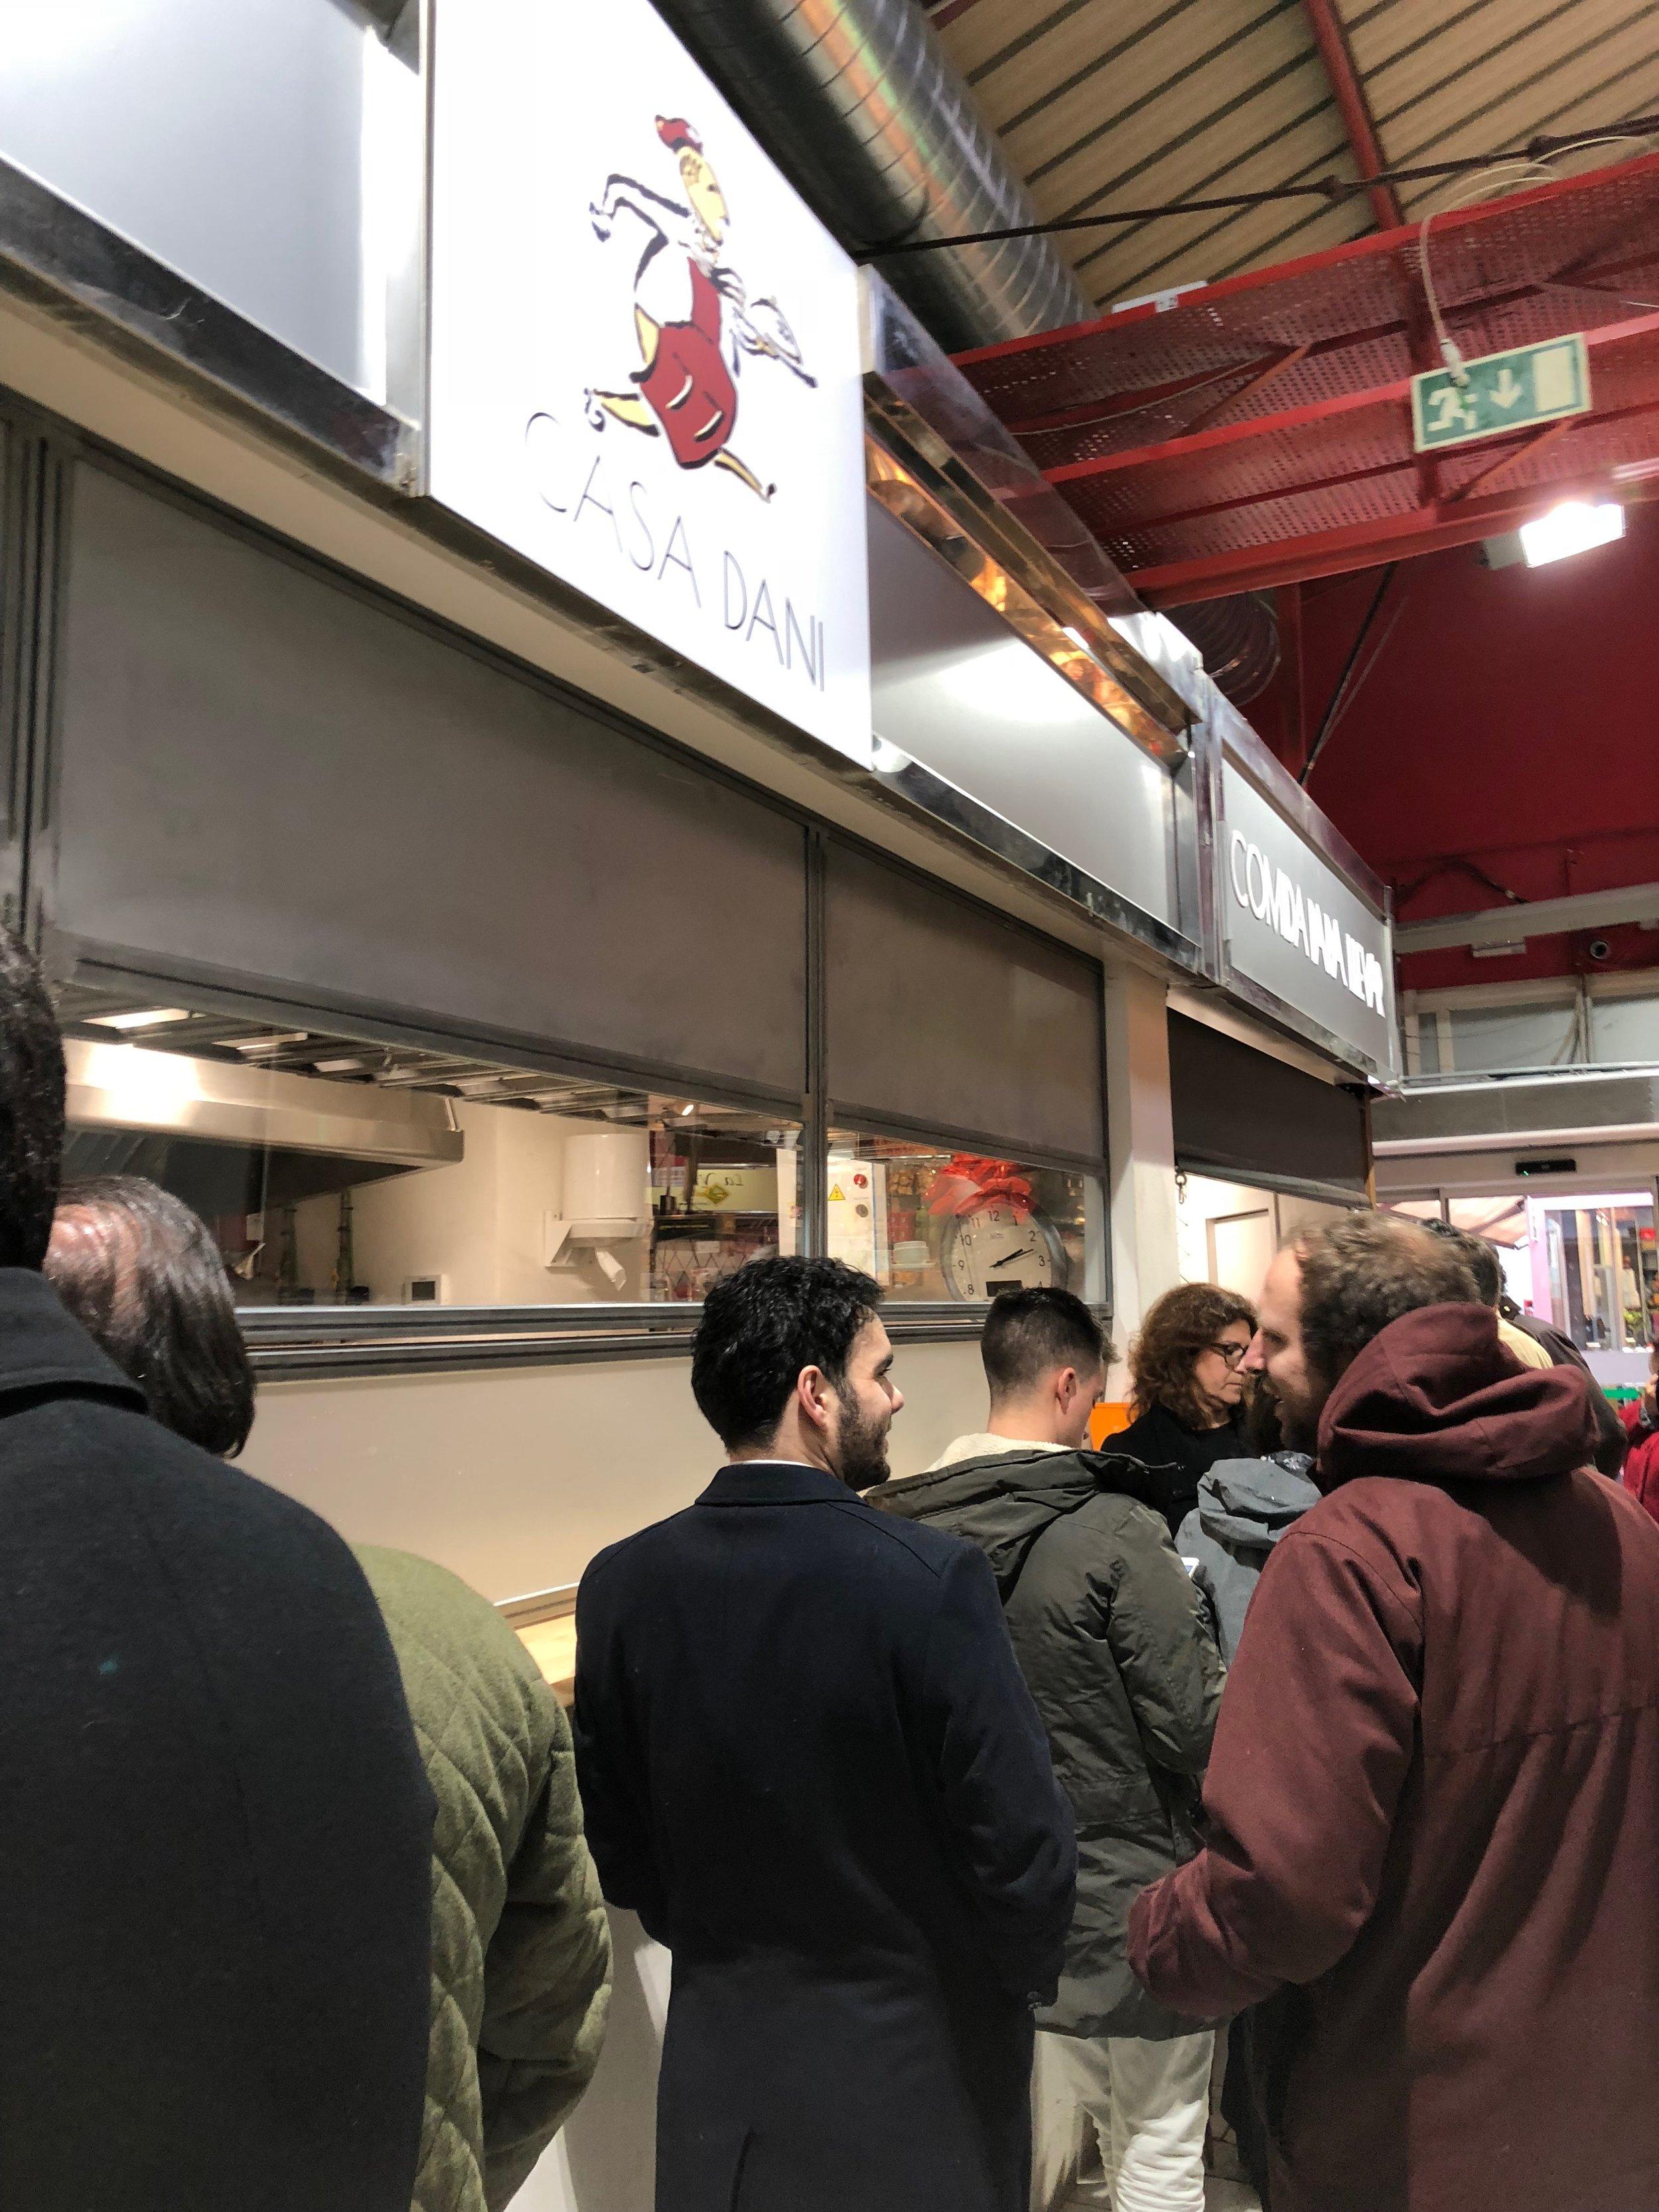 Casa Dani waiting in line